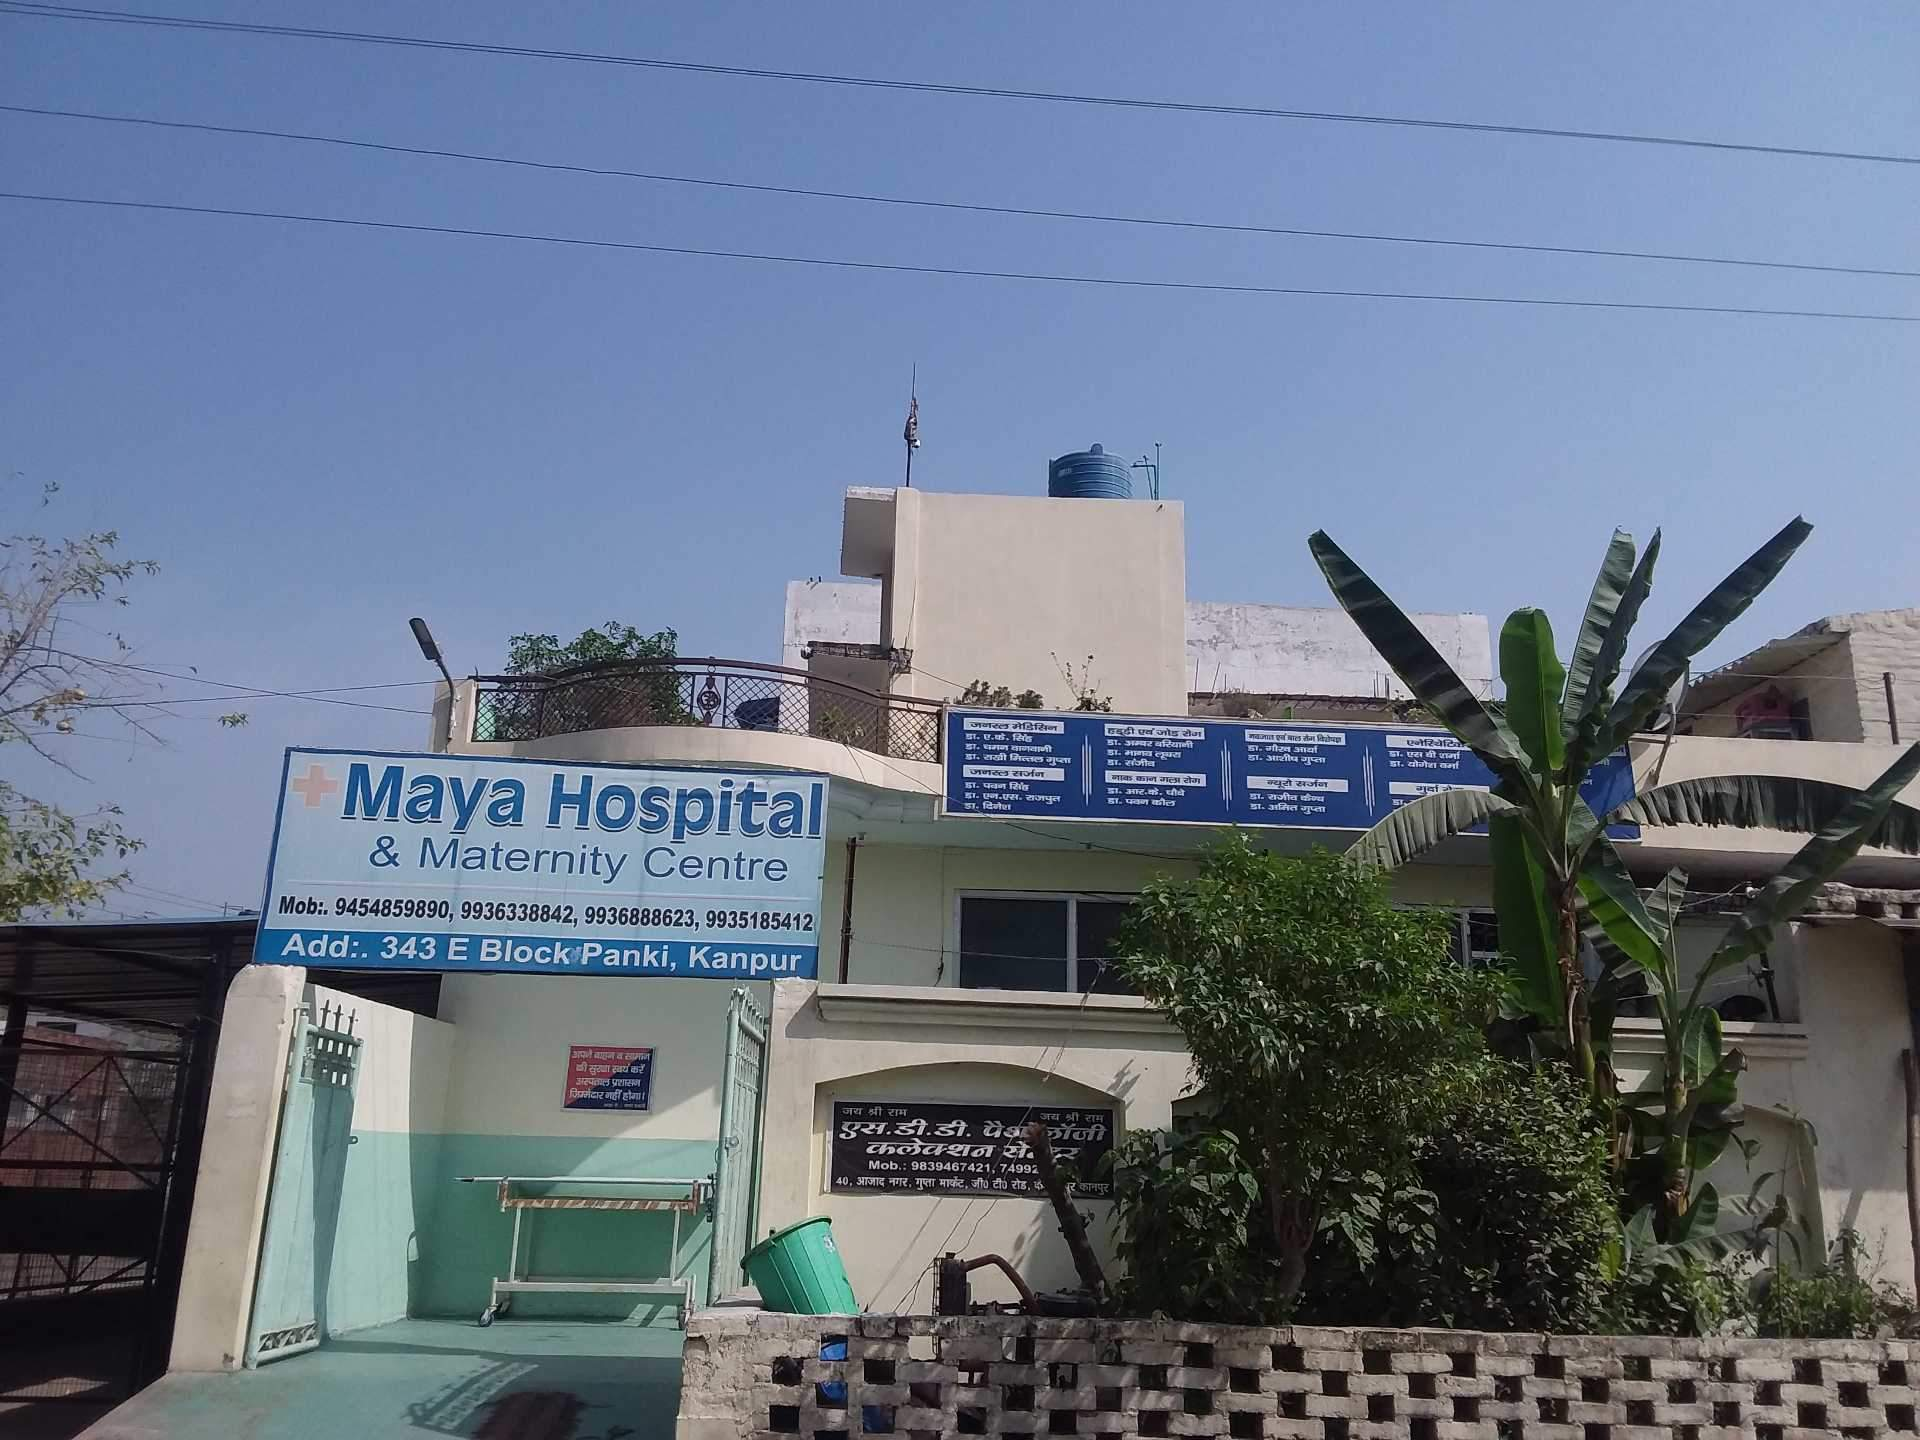 Maya Hospital and Maternity Centre - Panki - Kanpur Image